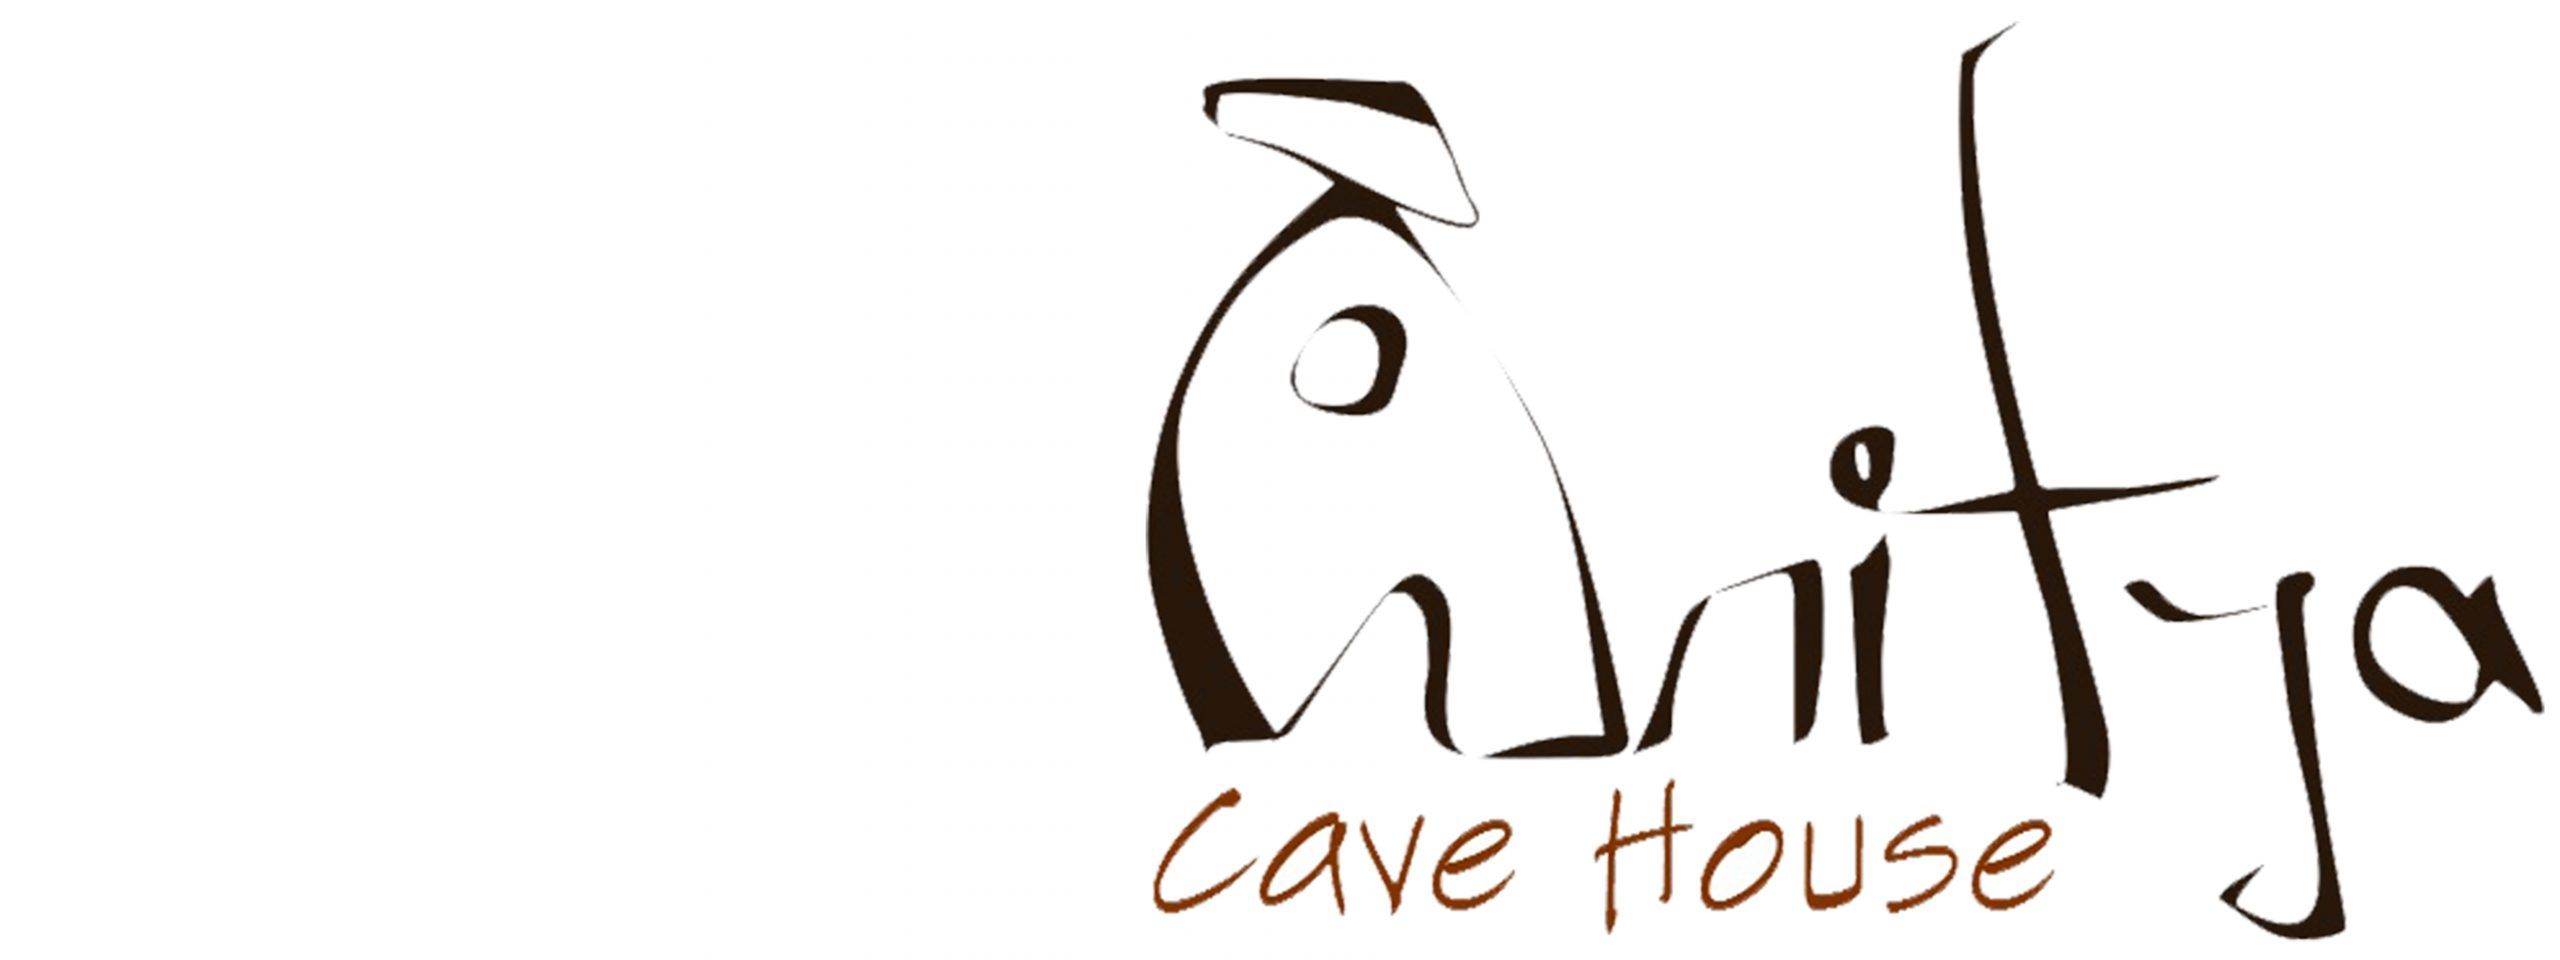 Anitya  CaveHouse